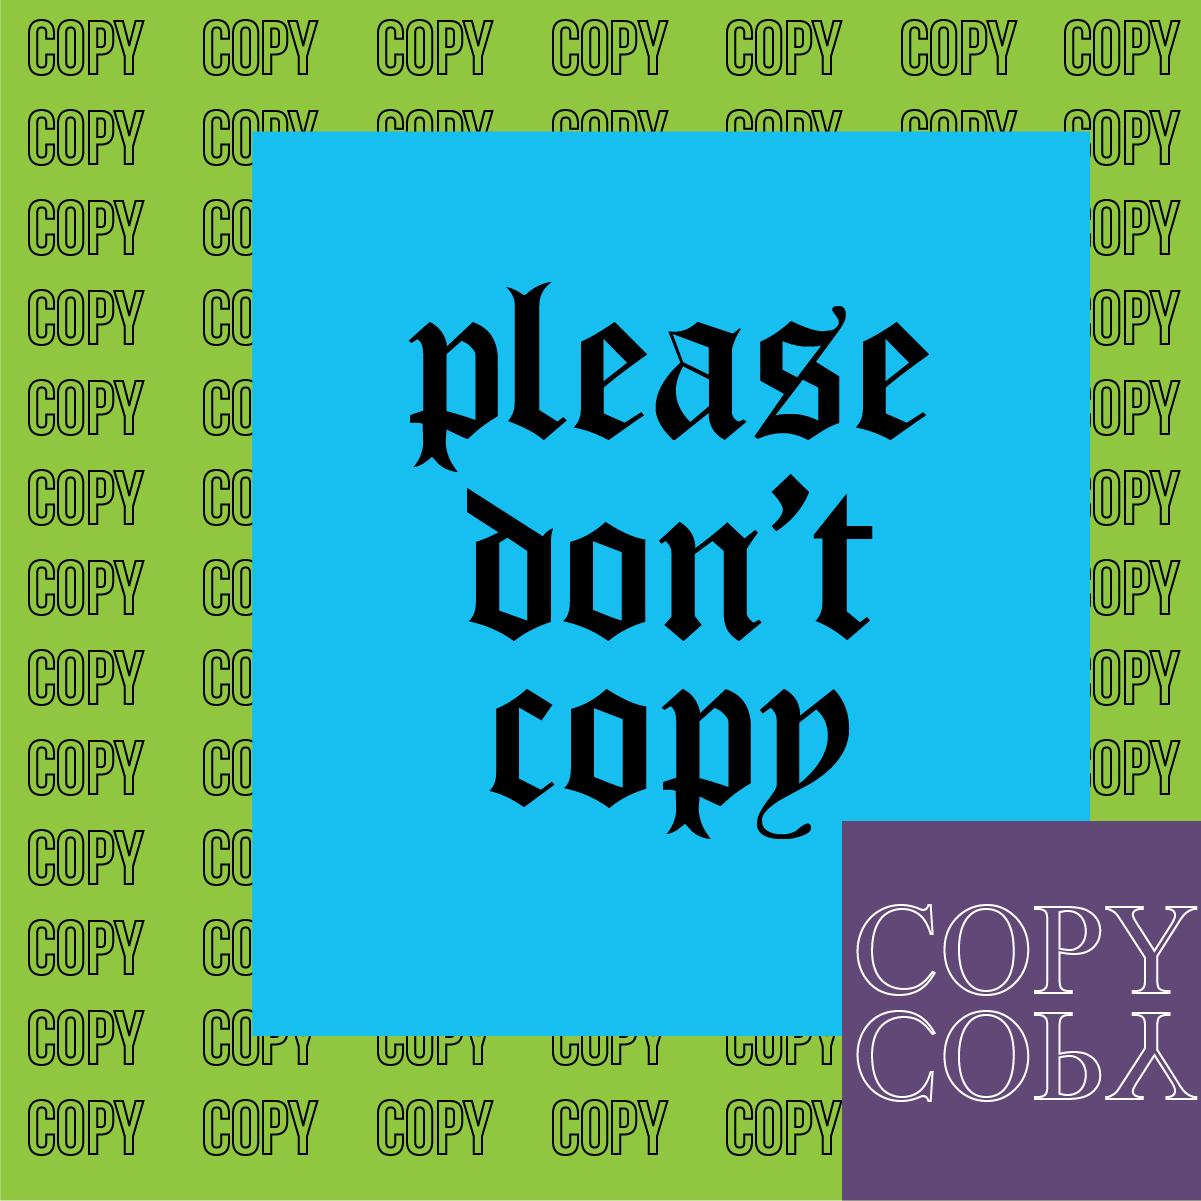 COPY COPY -04.jpg